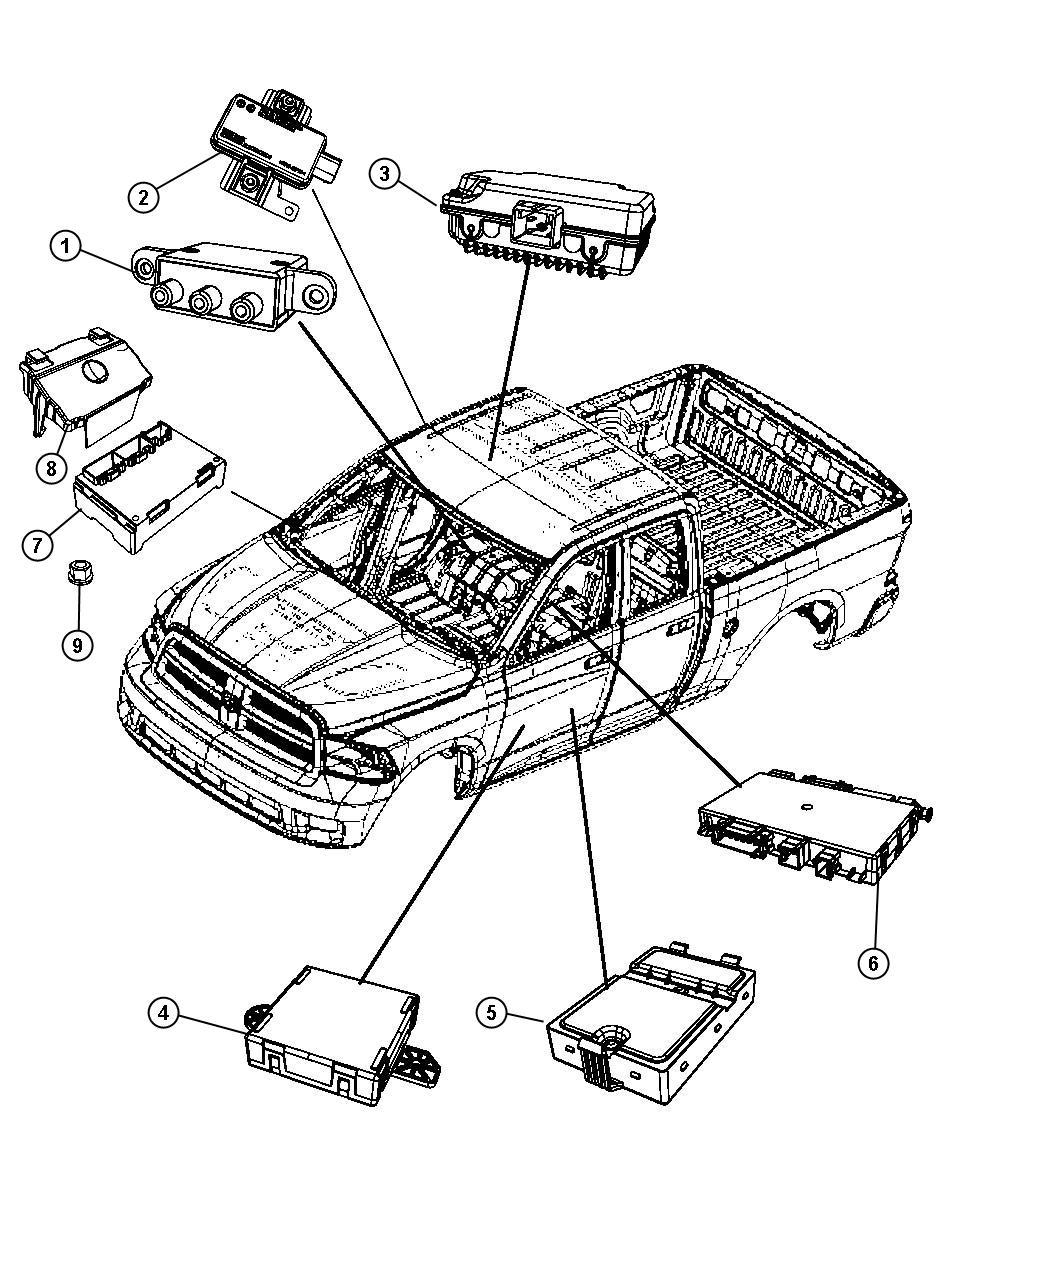 2013 Dodge Ram 1500 Module. Heated seat. Trim: [leather